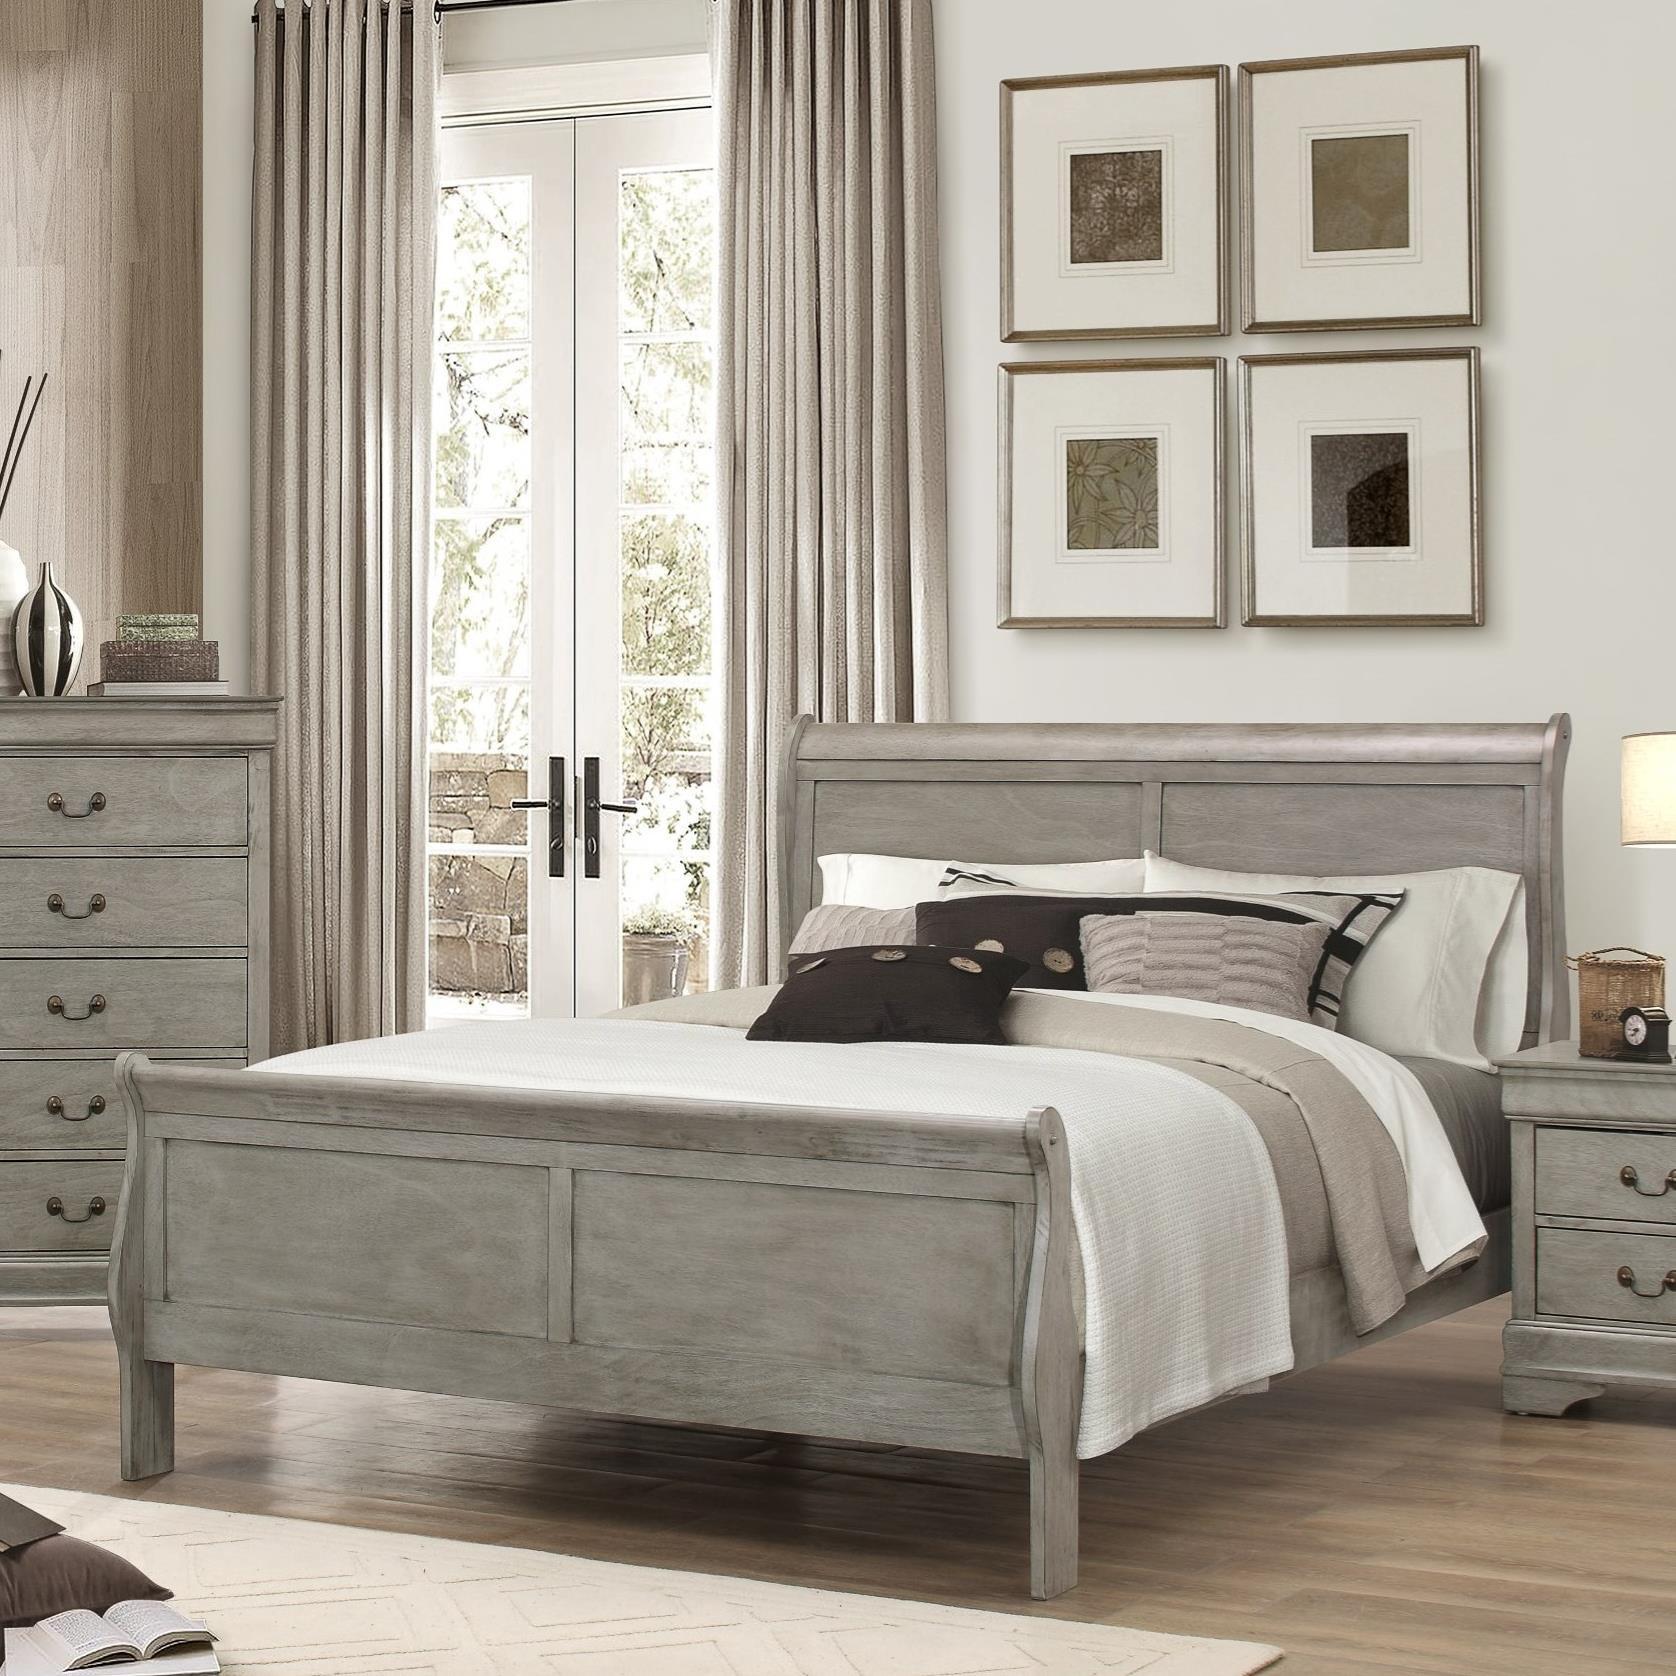 Crown Mark Louis Phillipe Queen Bed - Item Number: B3500-Q-HBFB+RAIL